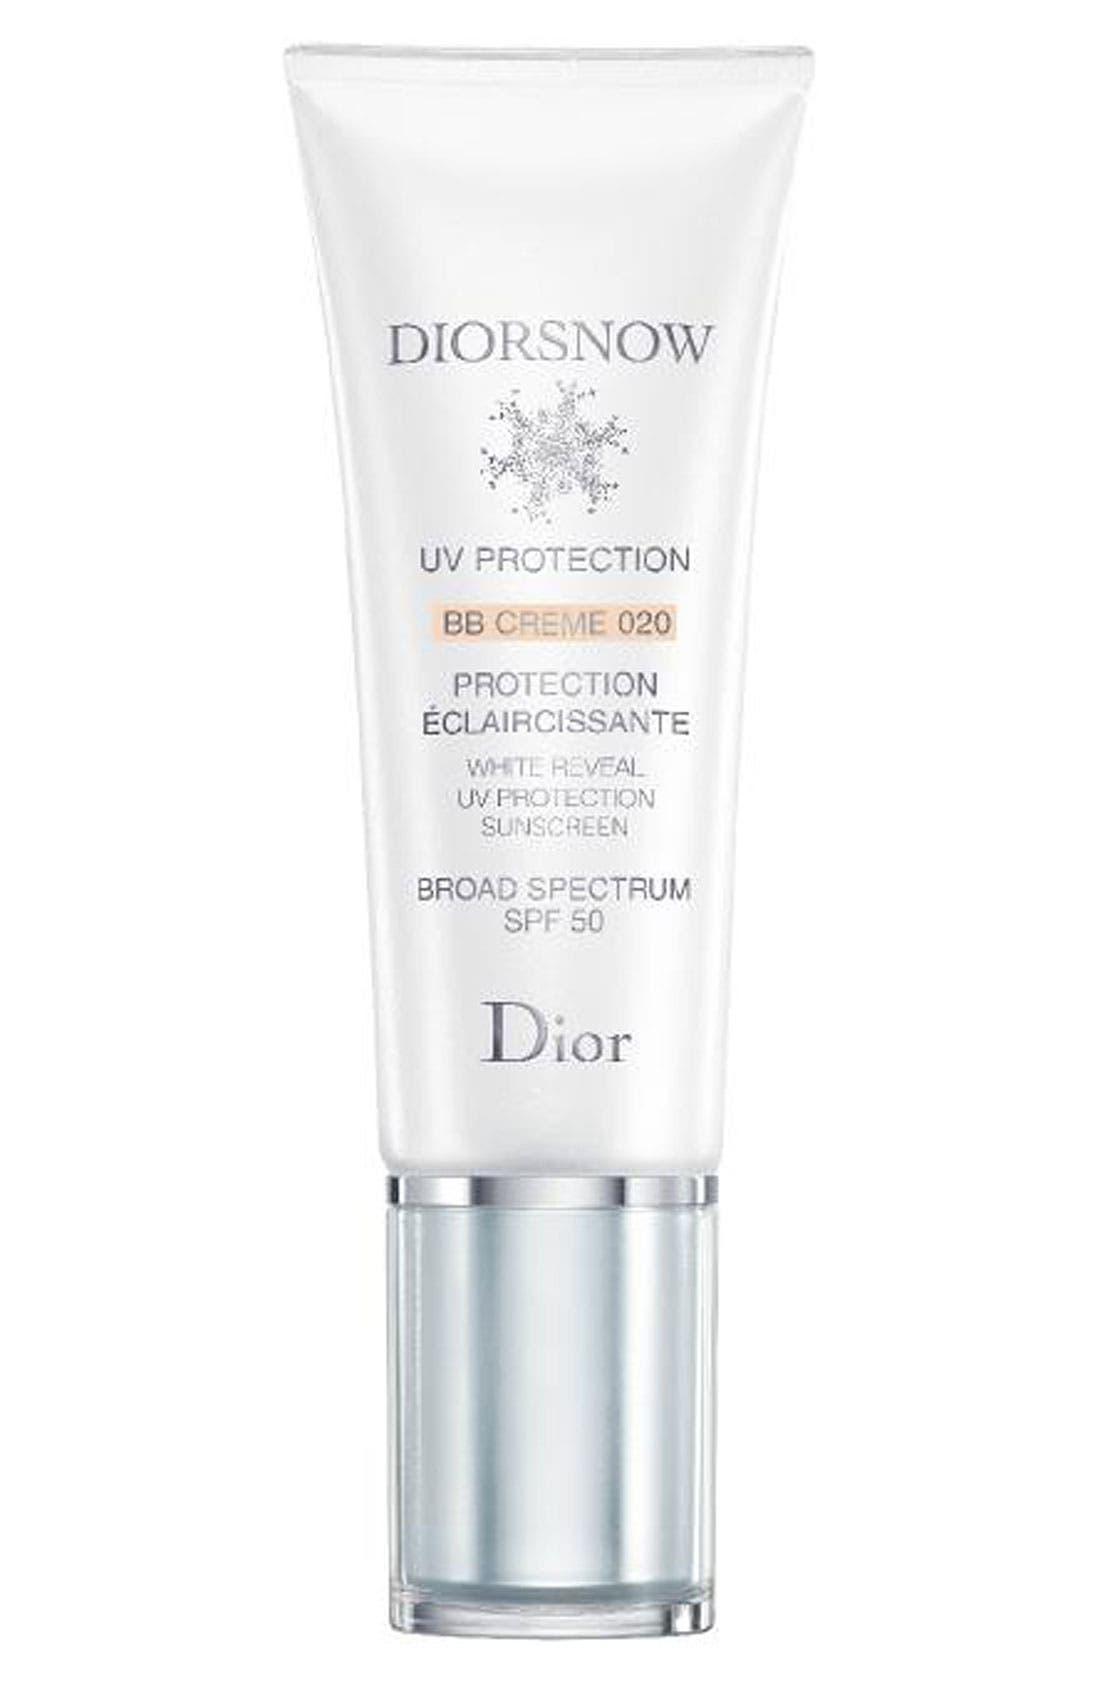 'Diorsnow' BB Creme Sunscreen Broad Spectrum SPF 50, Main, color, 250